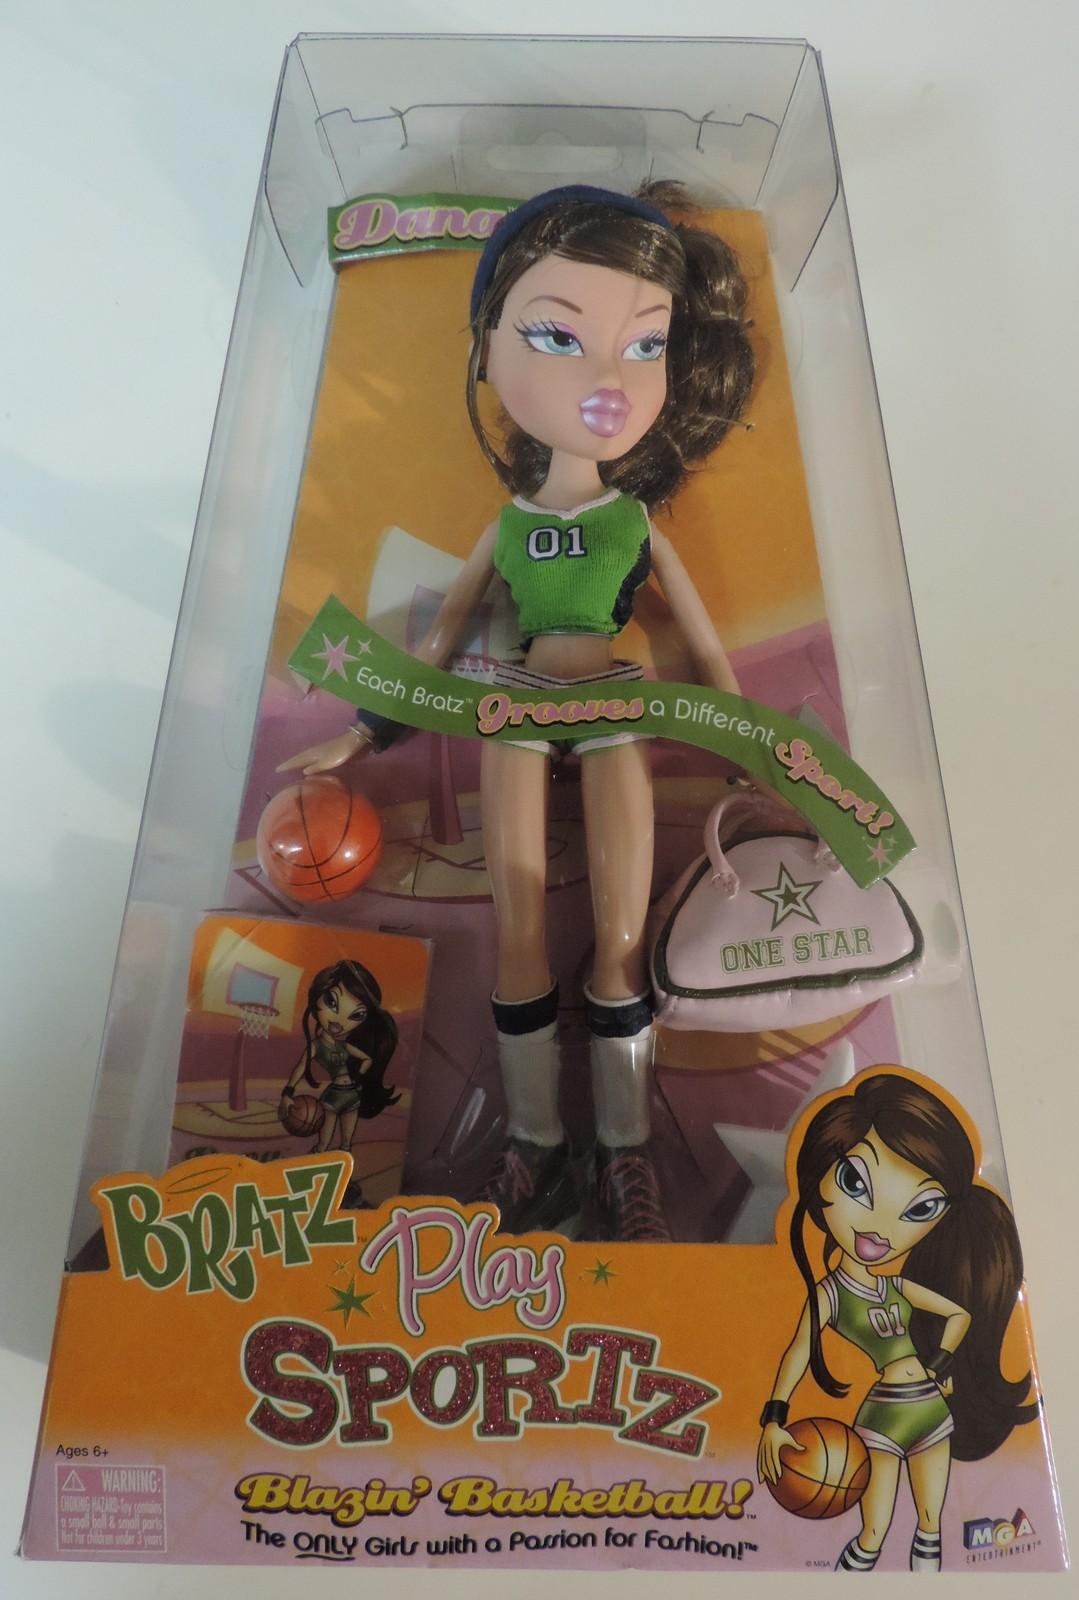 Bratz Play Sportz Blazin' Basketball Dana doll ( Barbie Monster High Liv ) - New